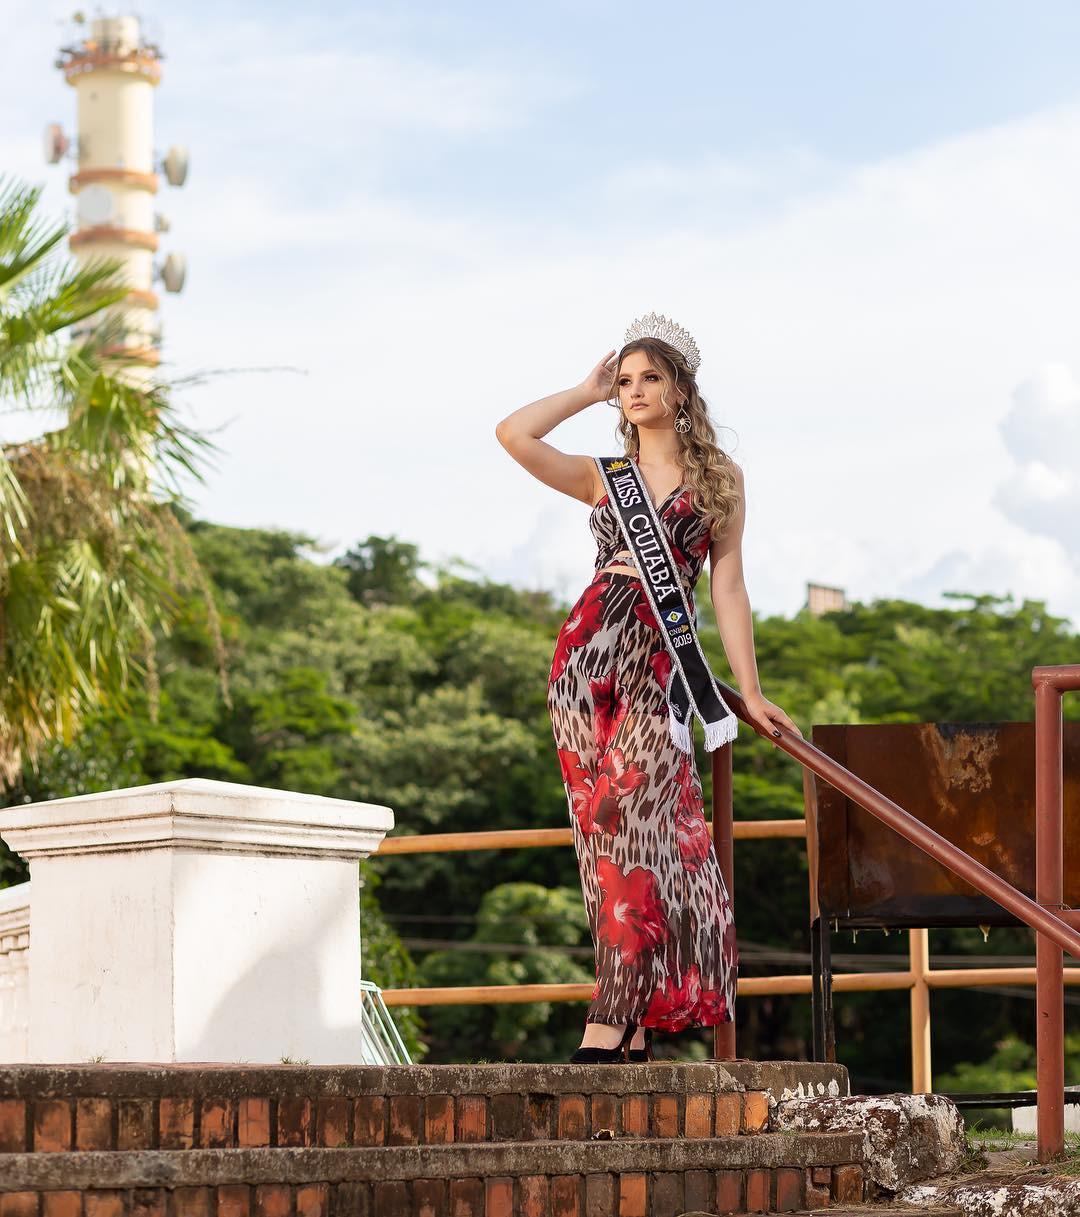 larissa neiverth, top 20 de miss brasil mundo 2019. - Página 5 Qgmug410